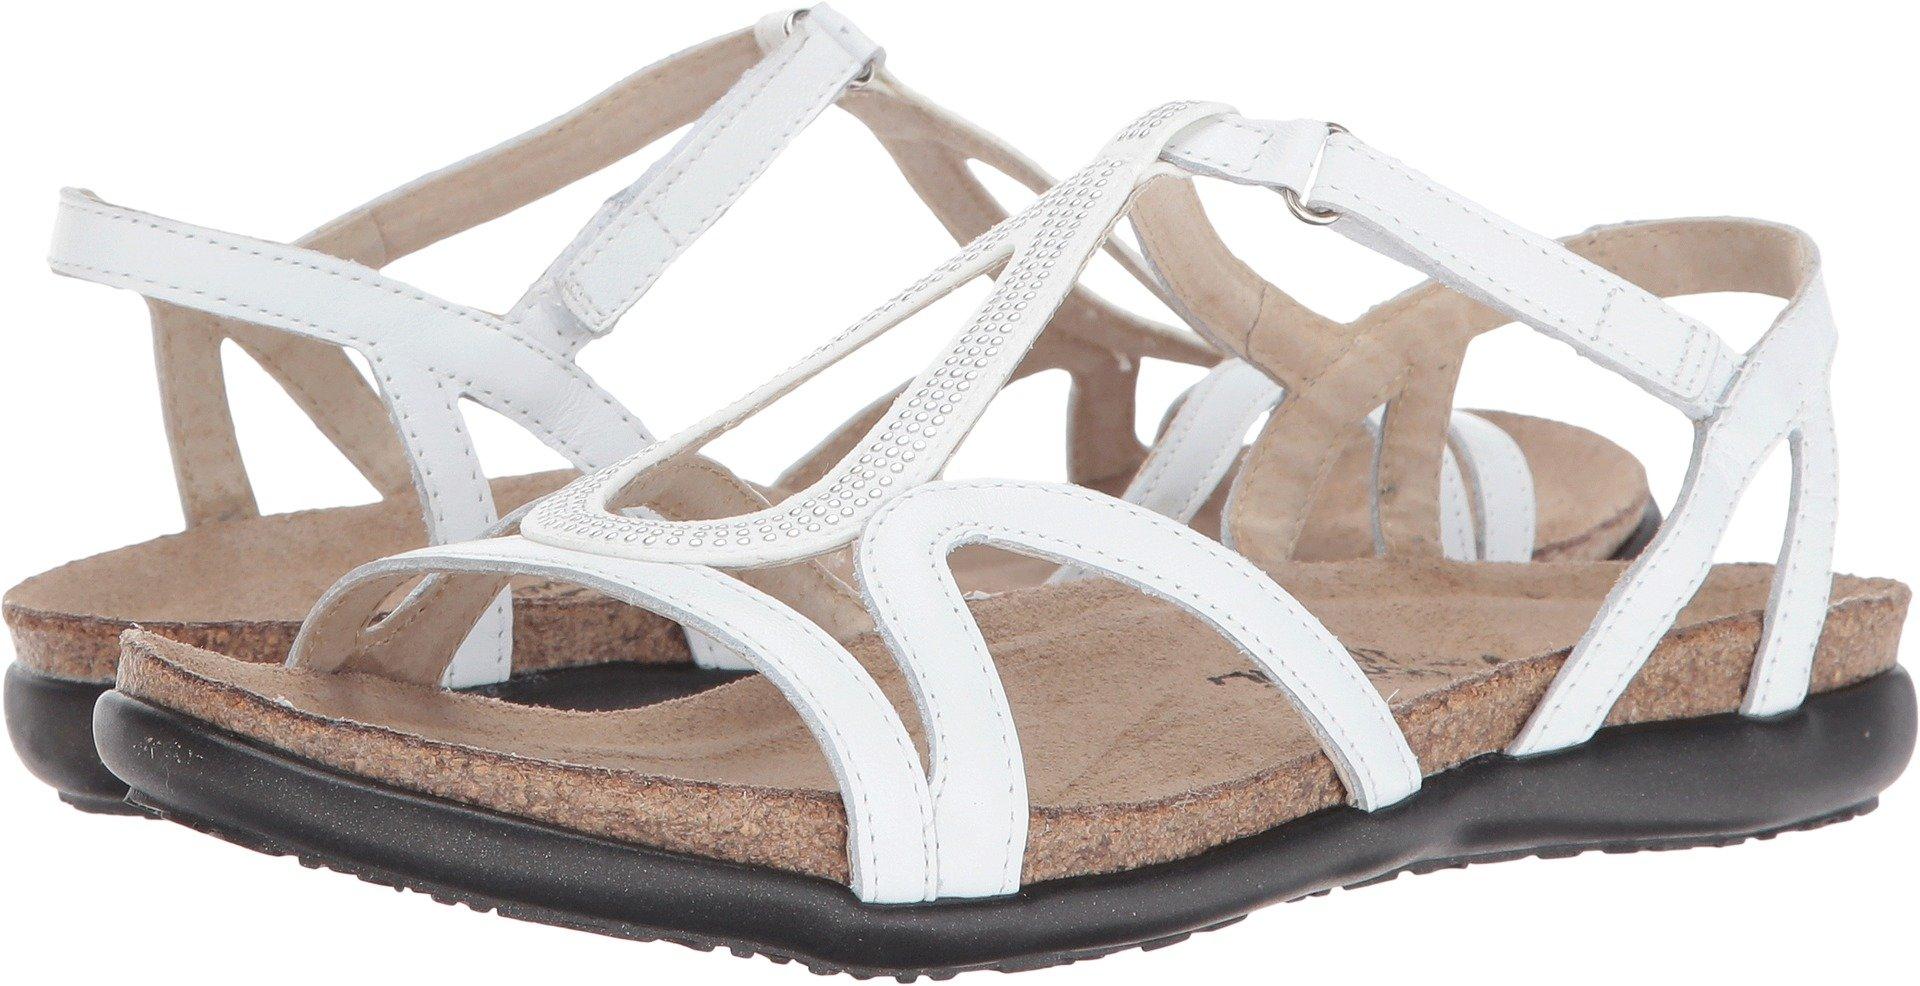 Naot Footwear Women's Tamara White Leather/Silver Rivets Sandal by Naot Footwear